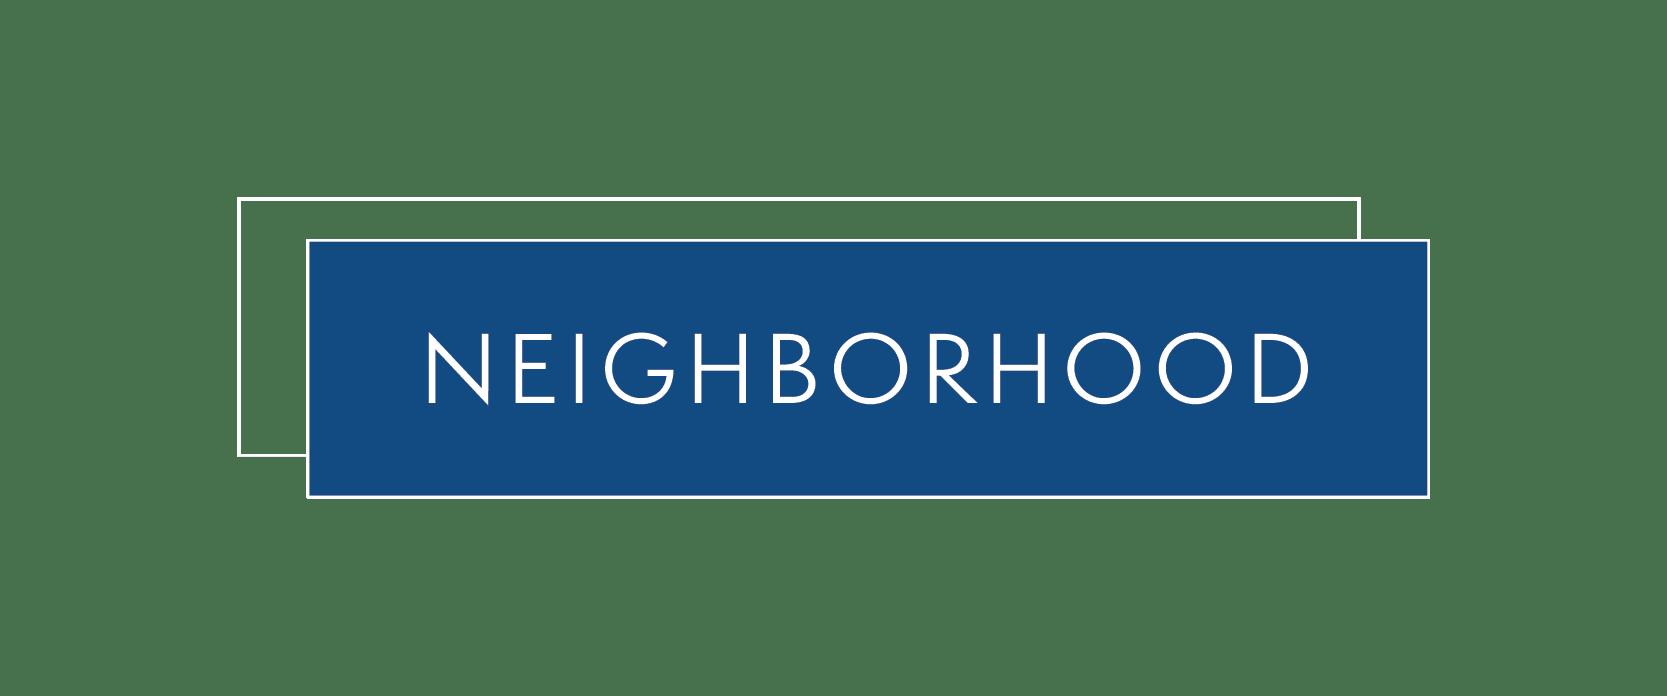 Link to neighborhood info for IMT Miramar in Miramar, Florida